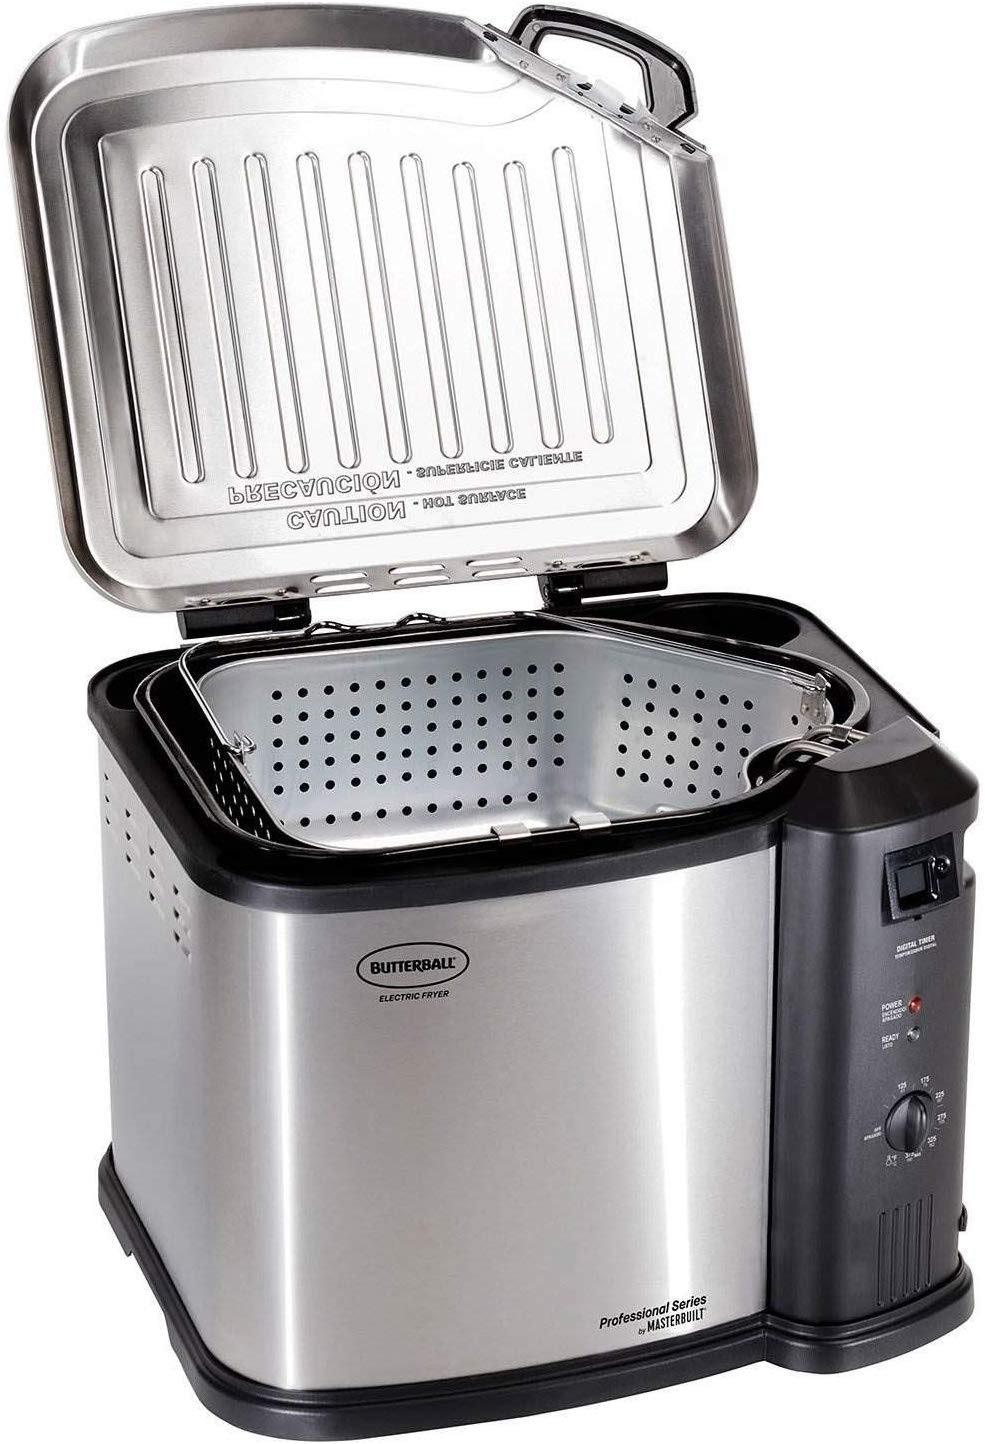 Masterbuilt 23011014 Electric Fryer Review